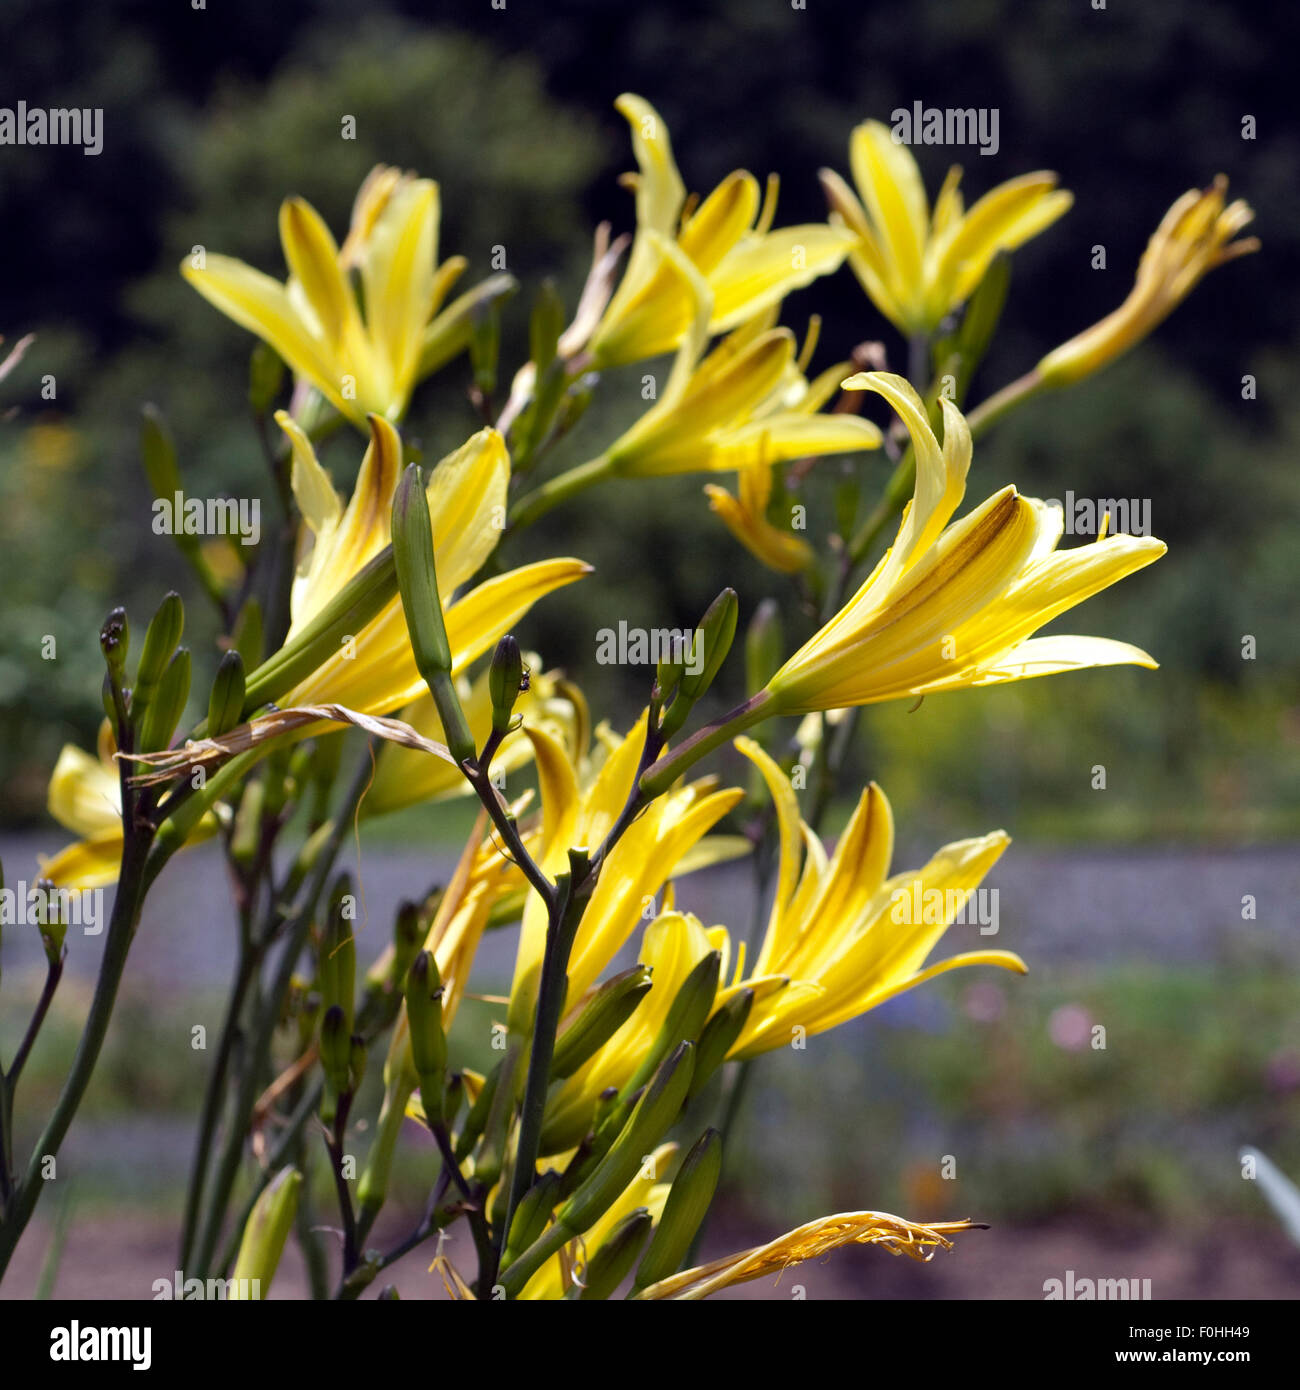 Lilien - Stock Image